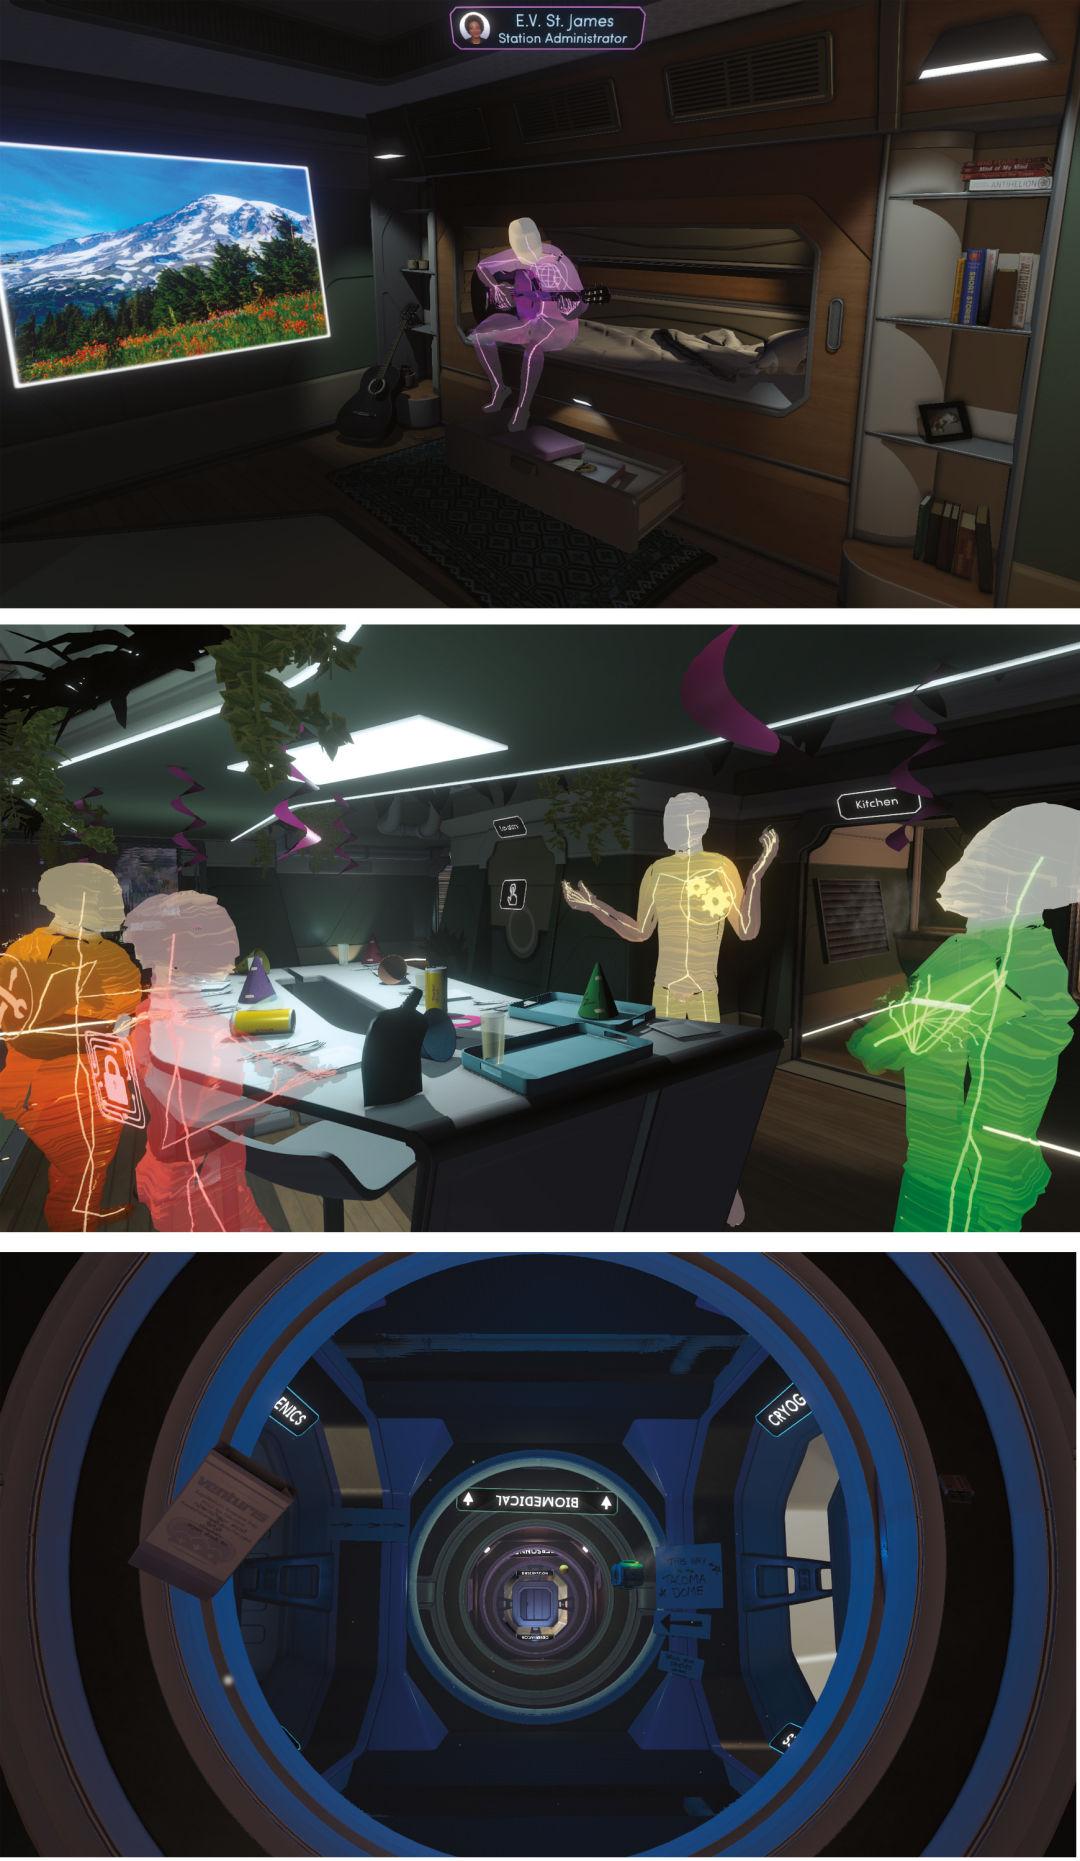 Pomo 0517 fullbright games tacoma screenshots qkqkei